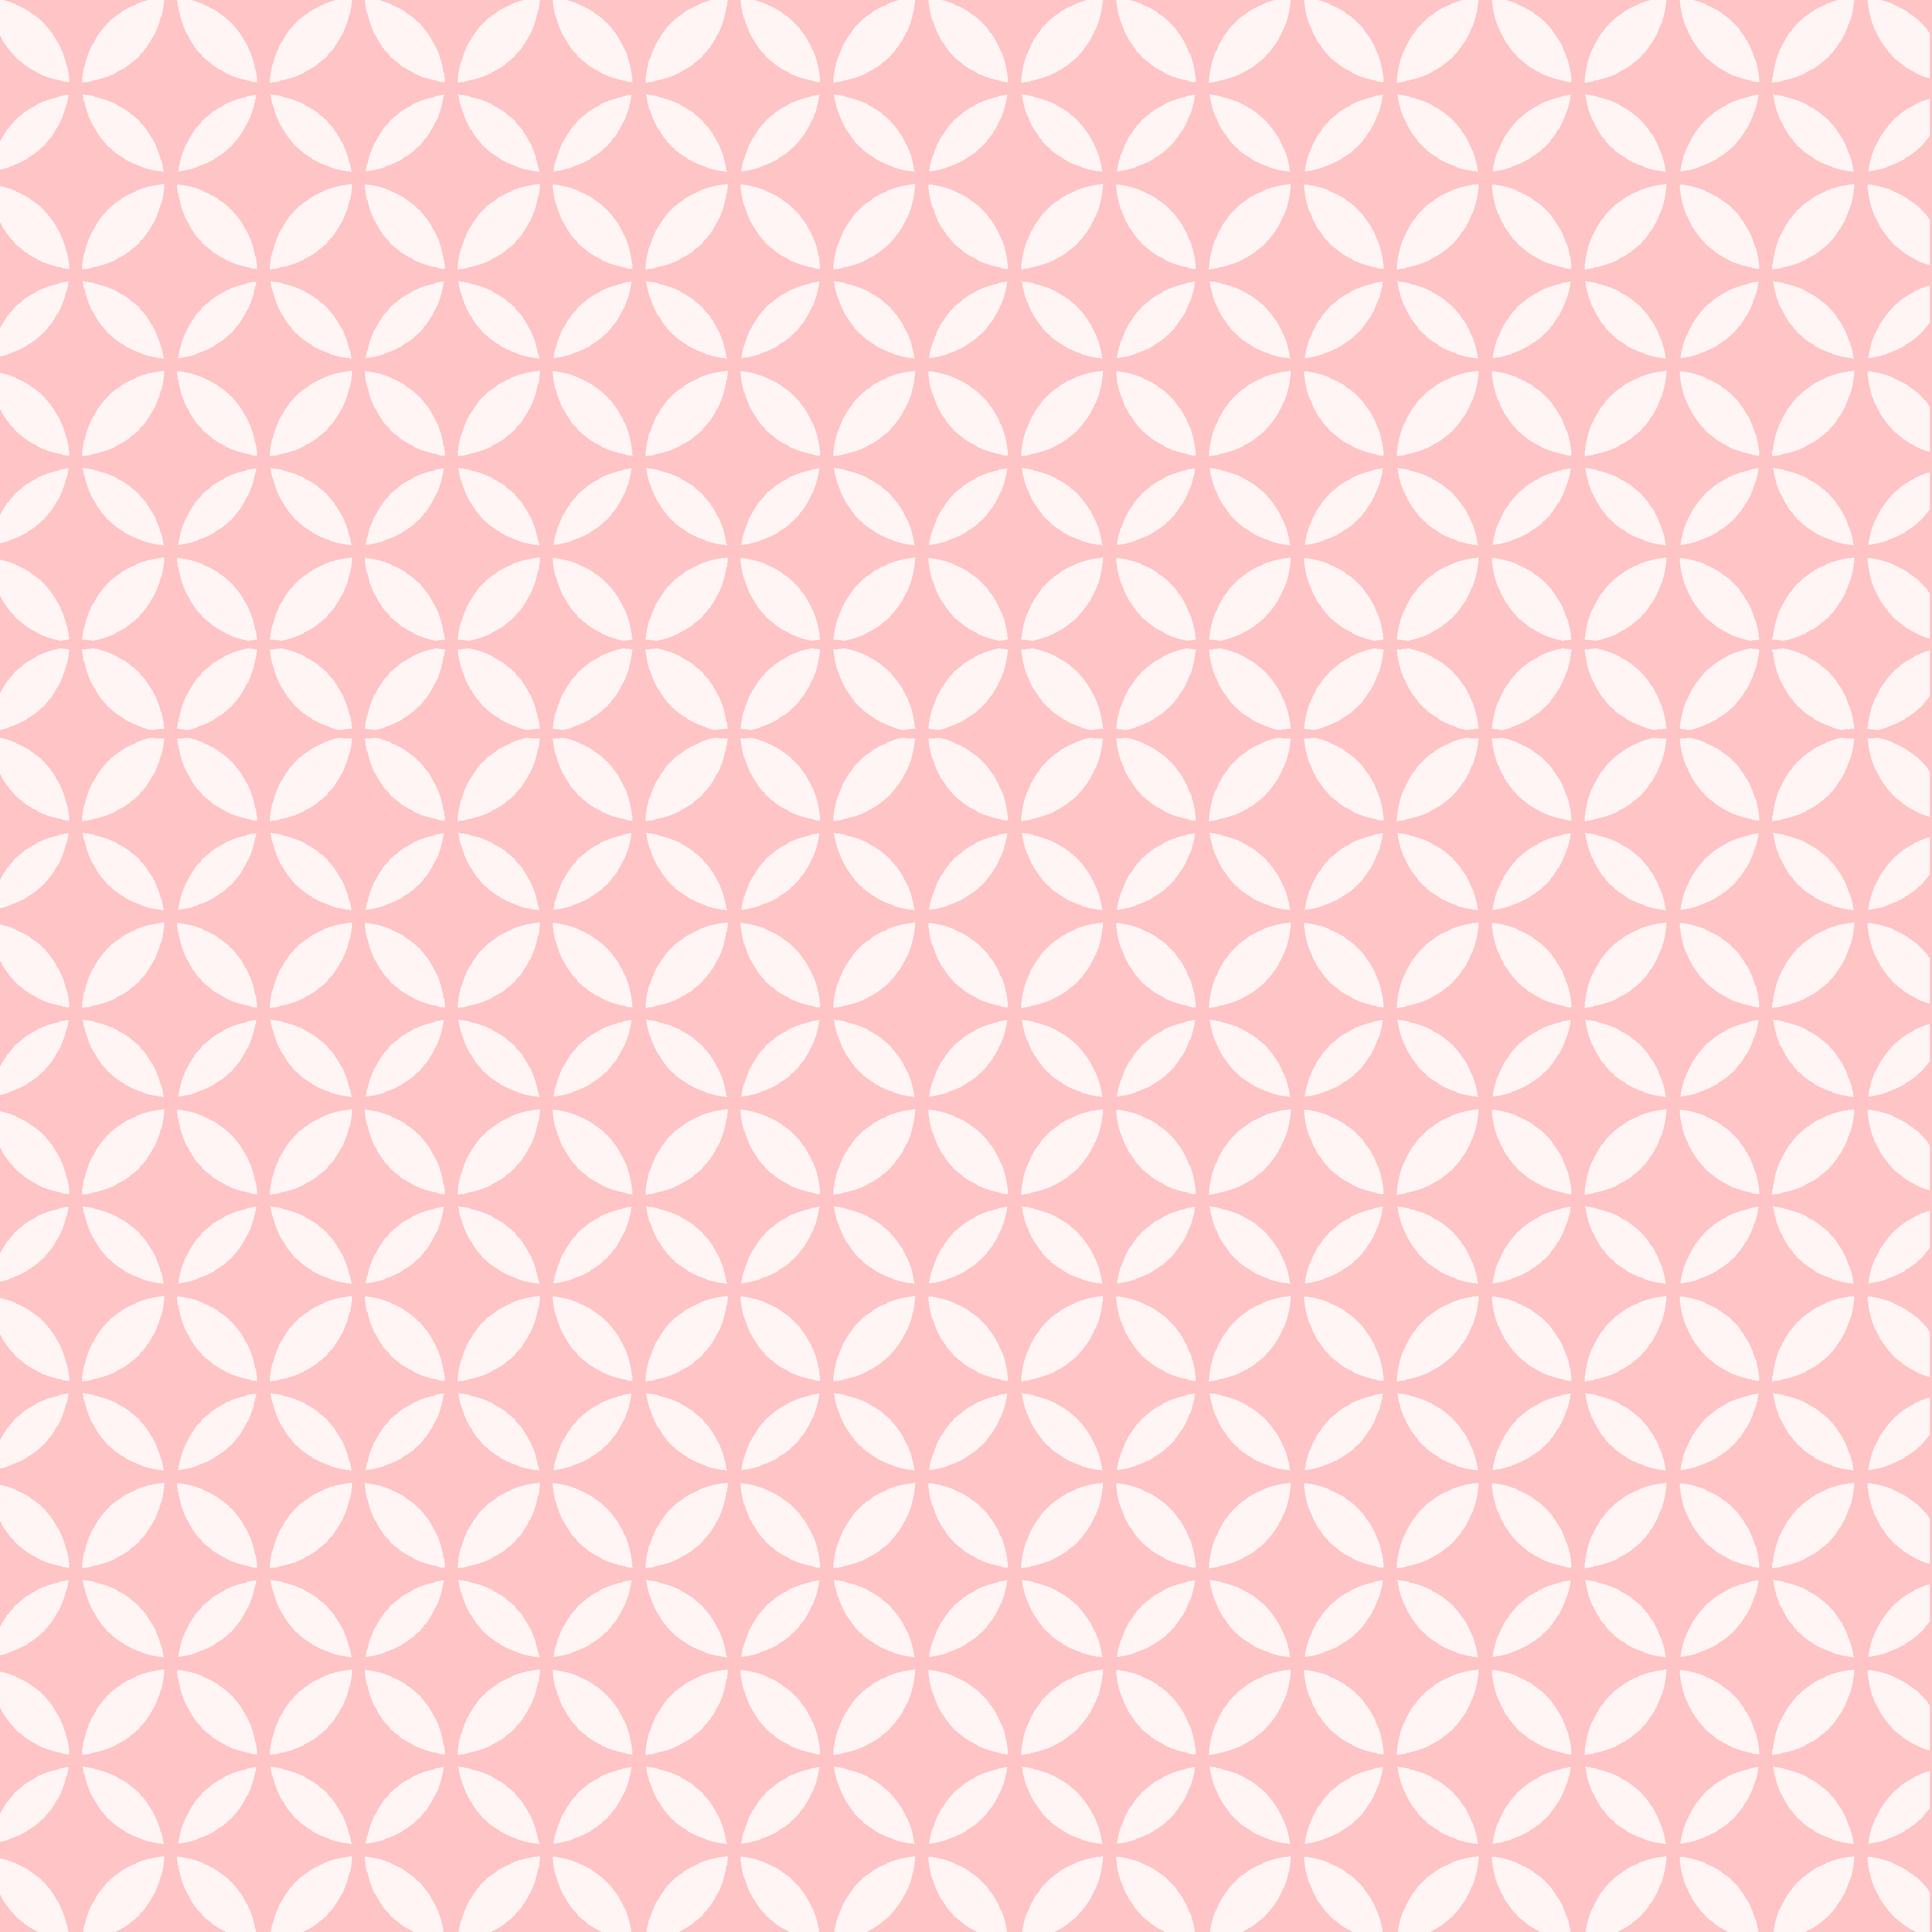 Download Victorian Dolls House Wallpaper Gallery: Dollhouse Wallpaper